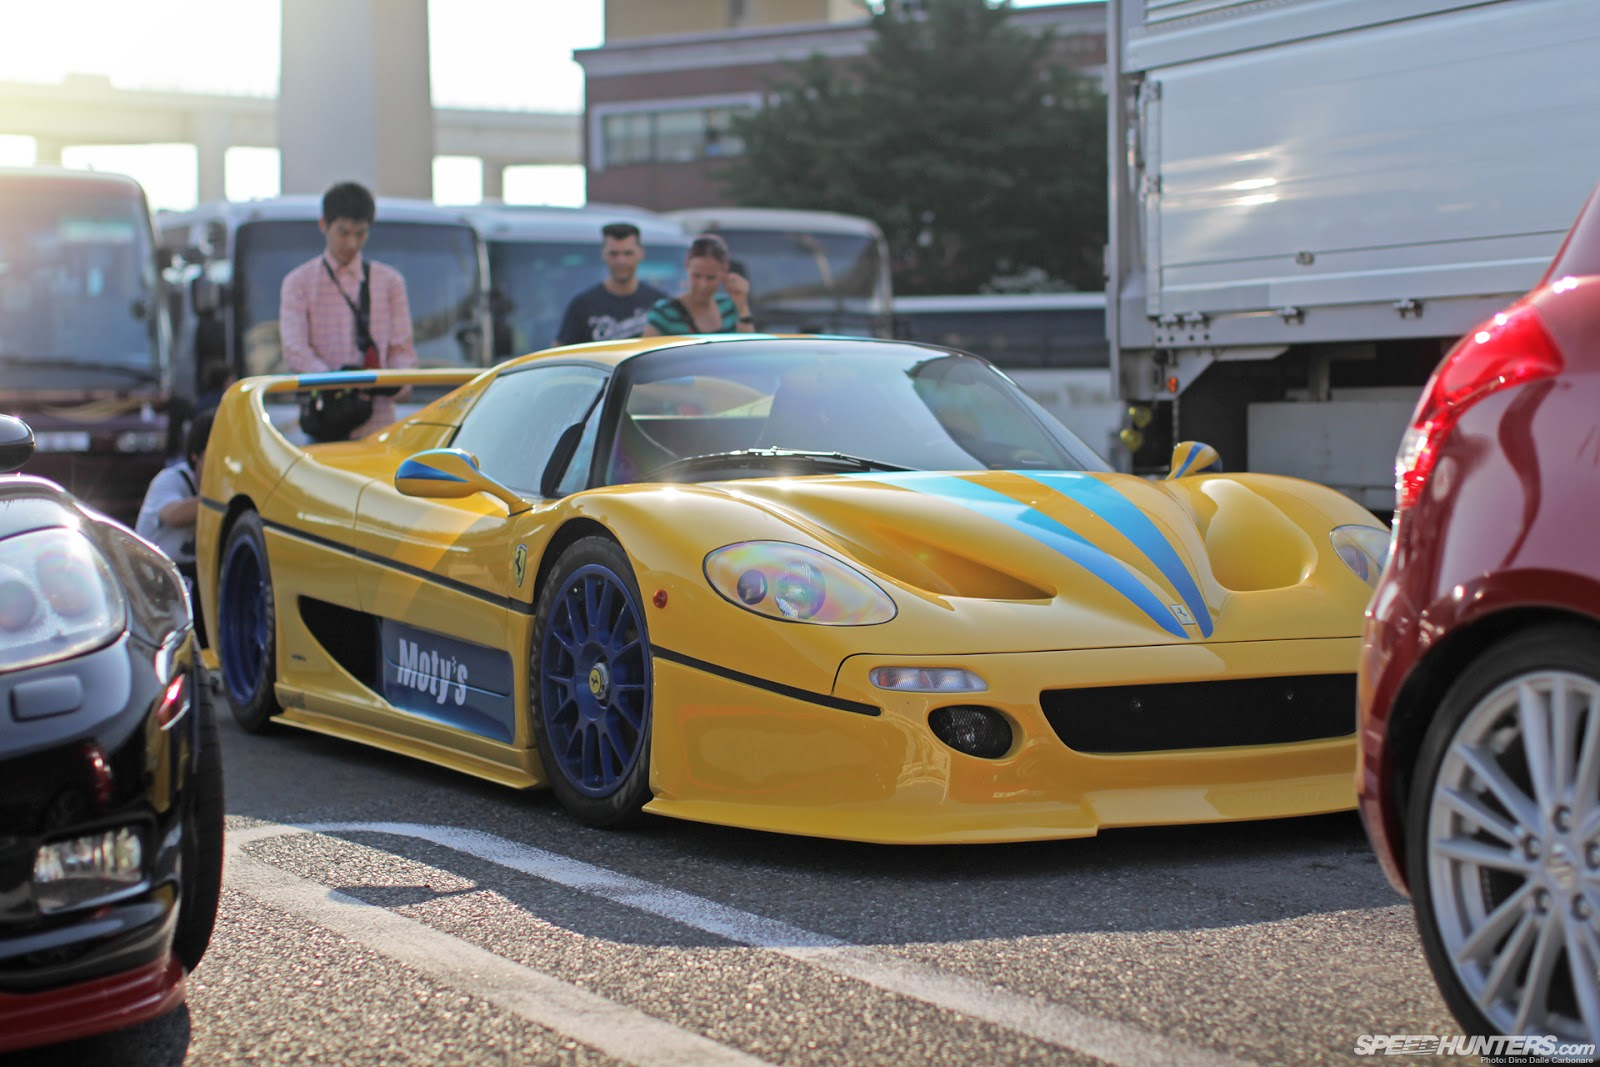 Photo: Ferrari F50 with Body Kit